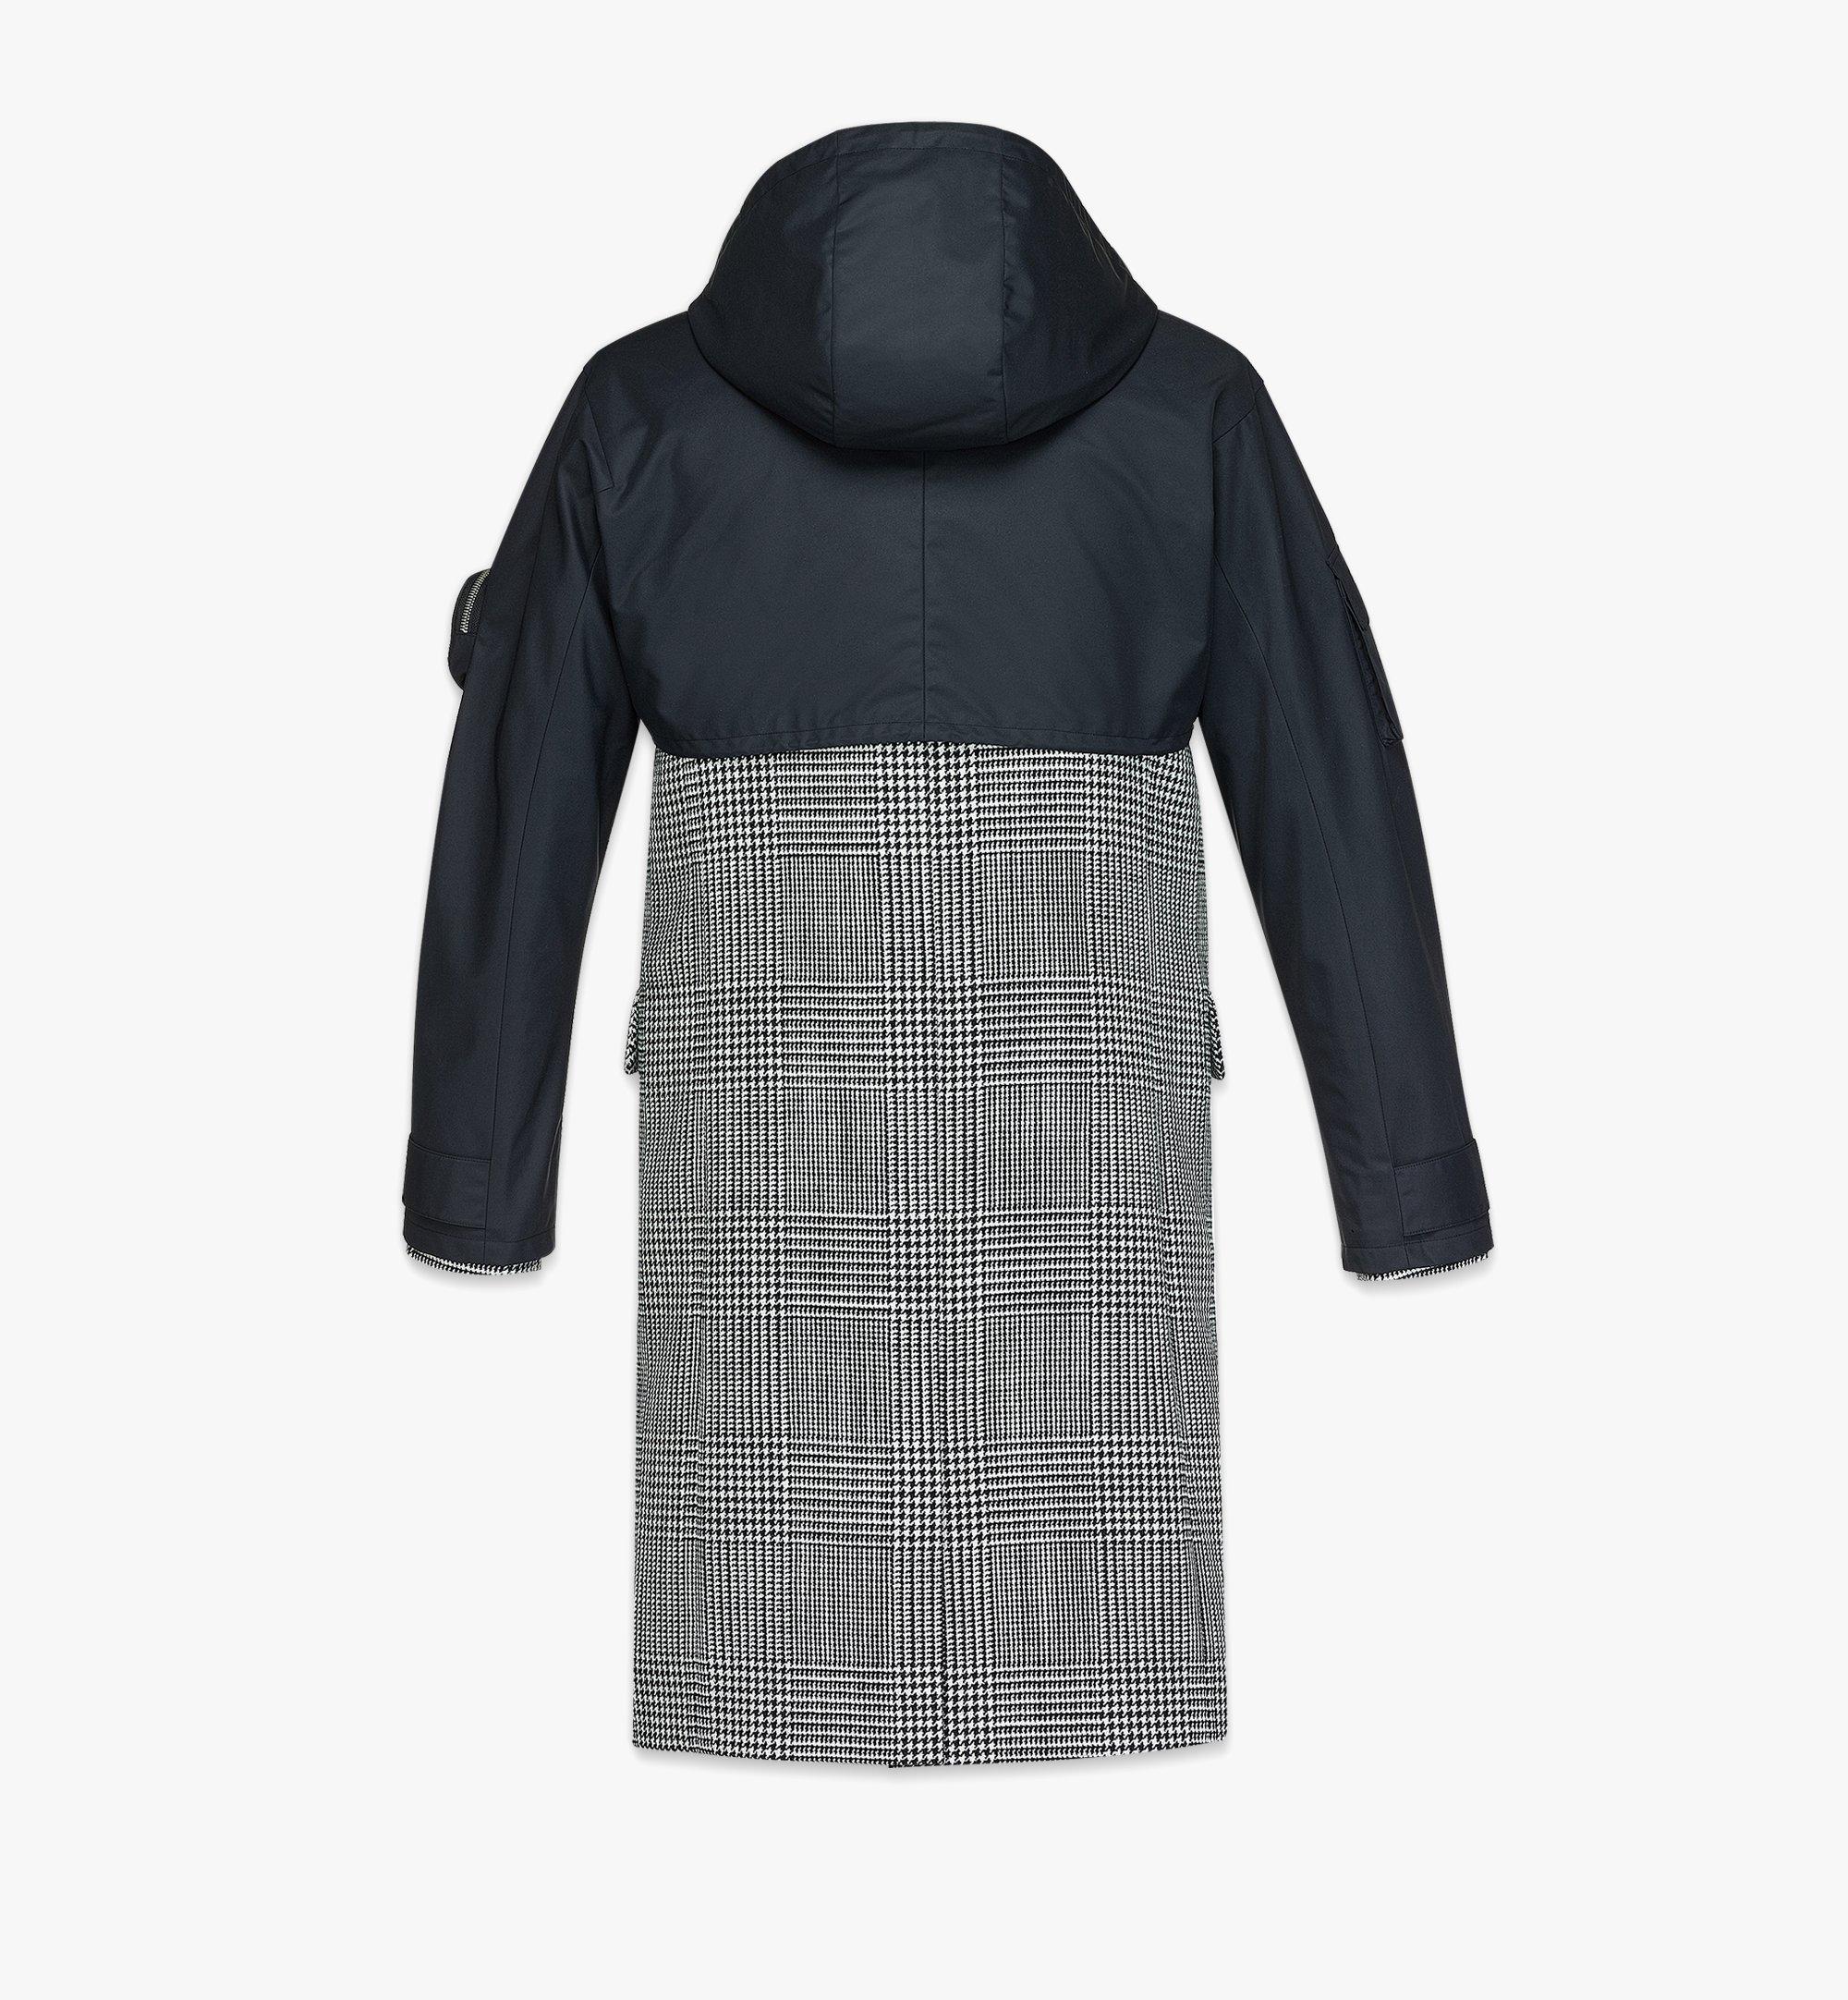 MCM Men's Check Wool Coat with Nylon Overlay Black MHCBAMM01BK046 Alternate View 3